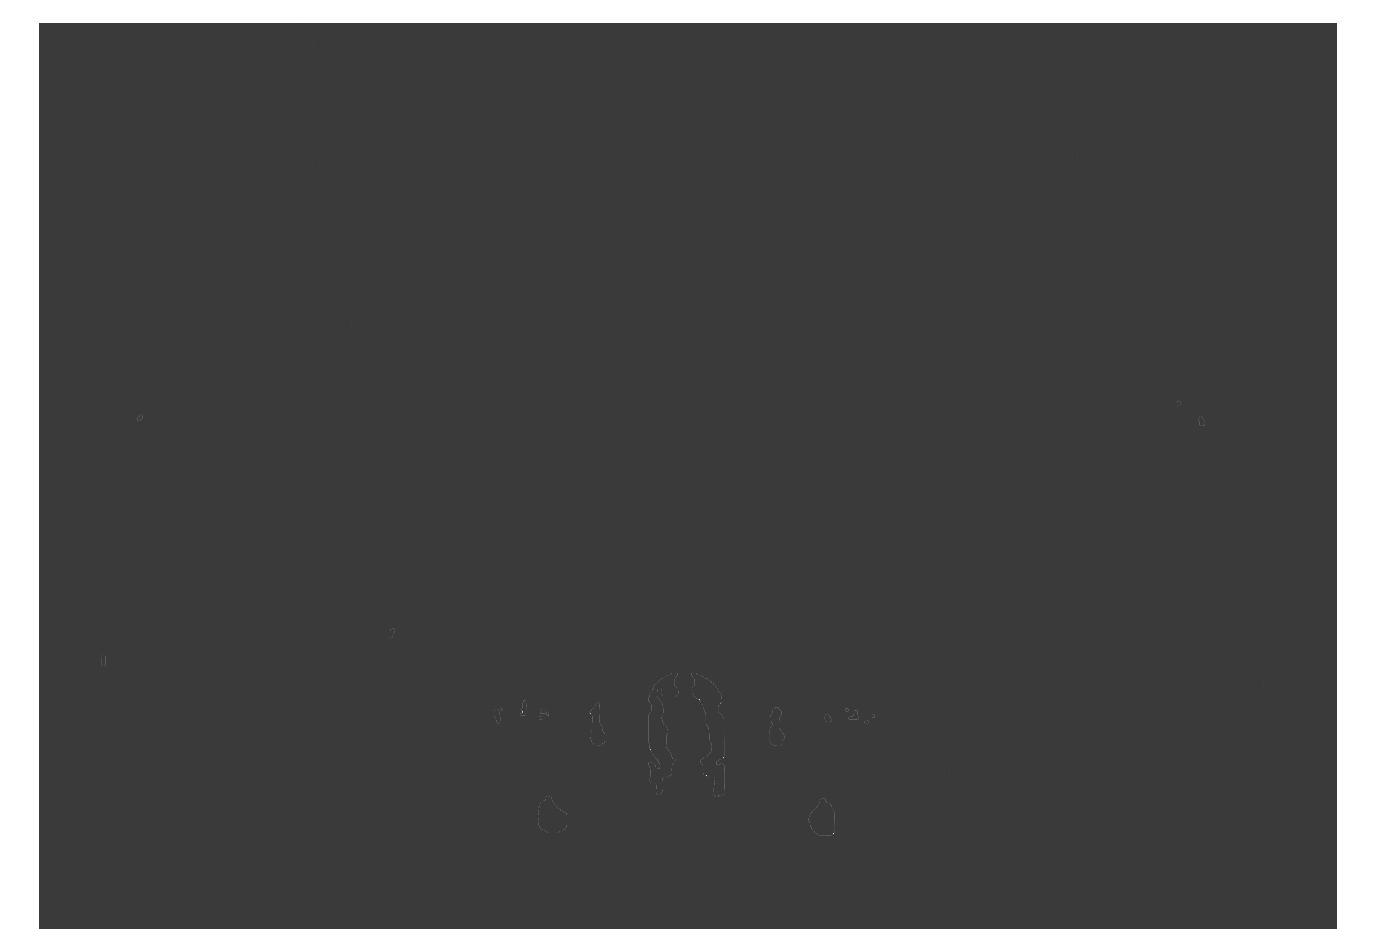 camino-das-estelas-silueta-catedral-footer